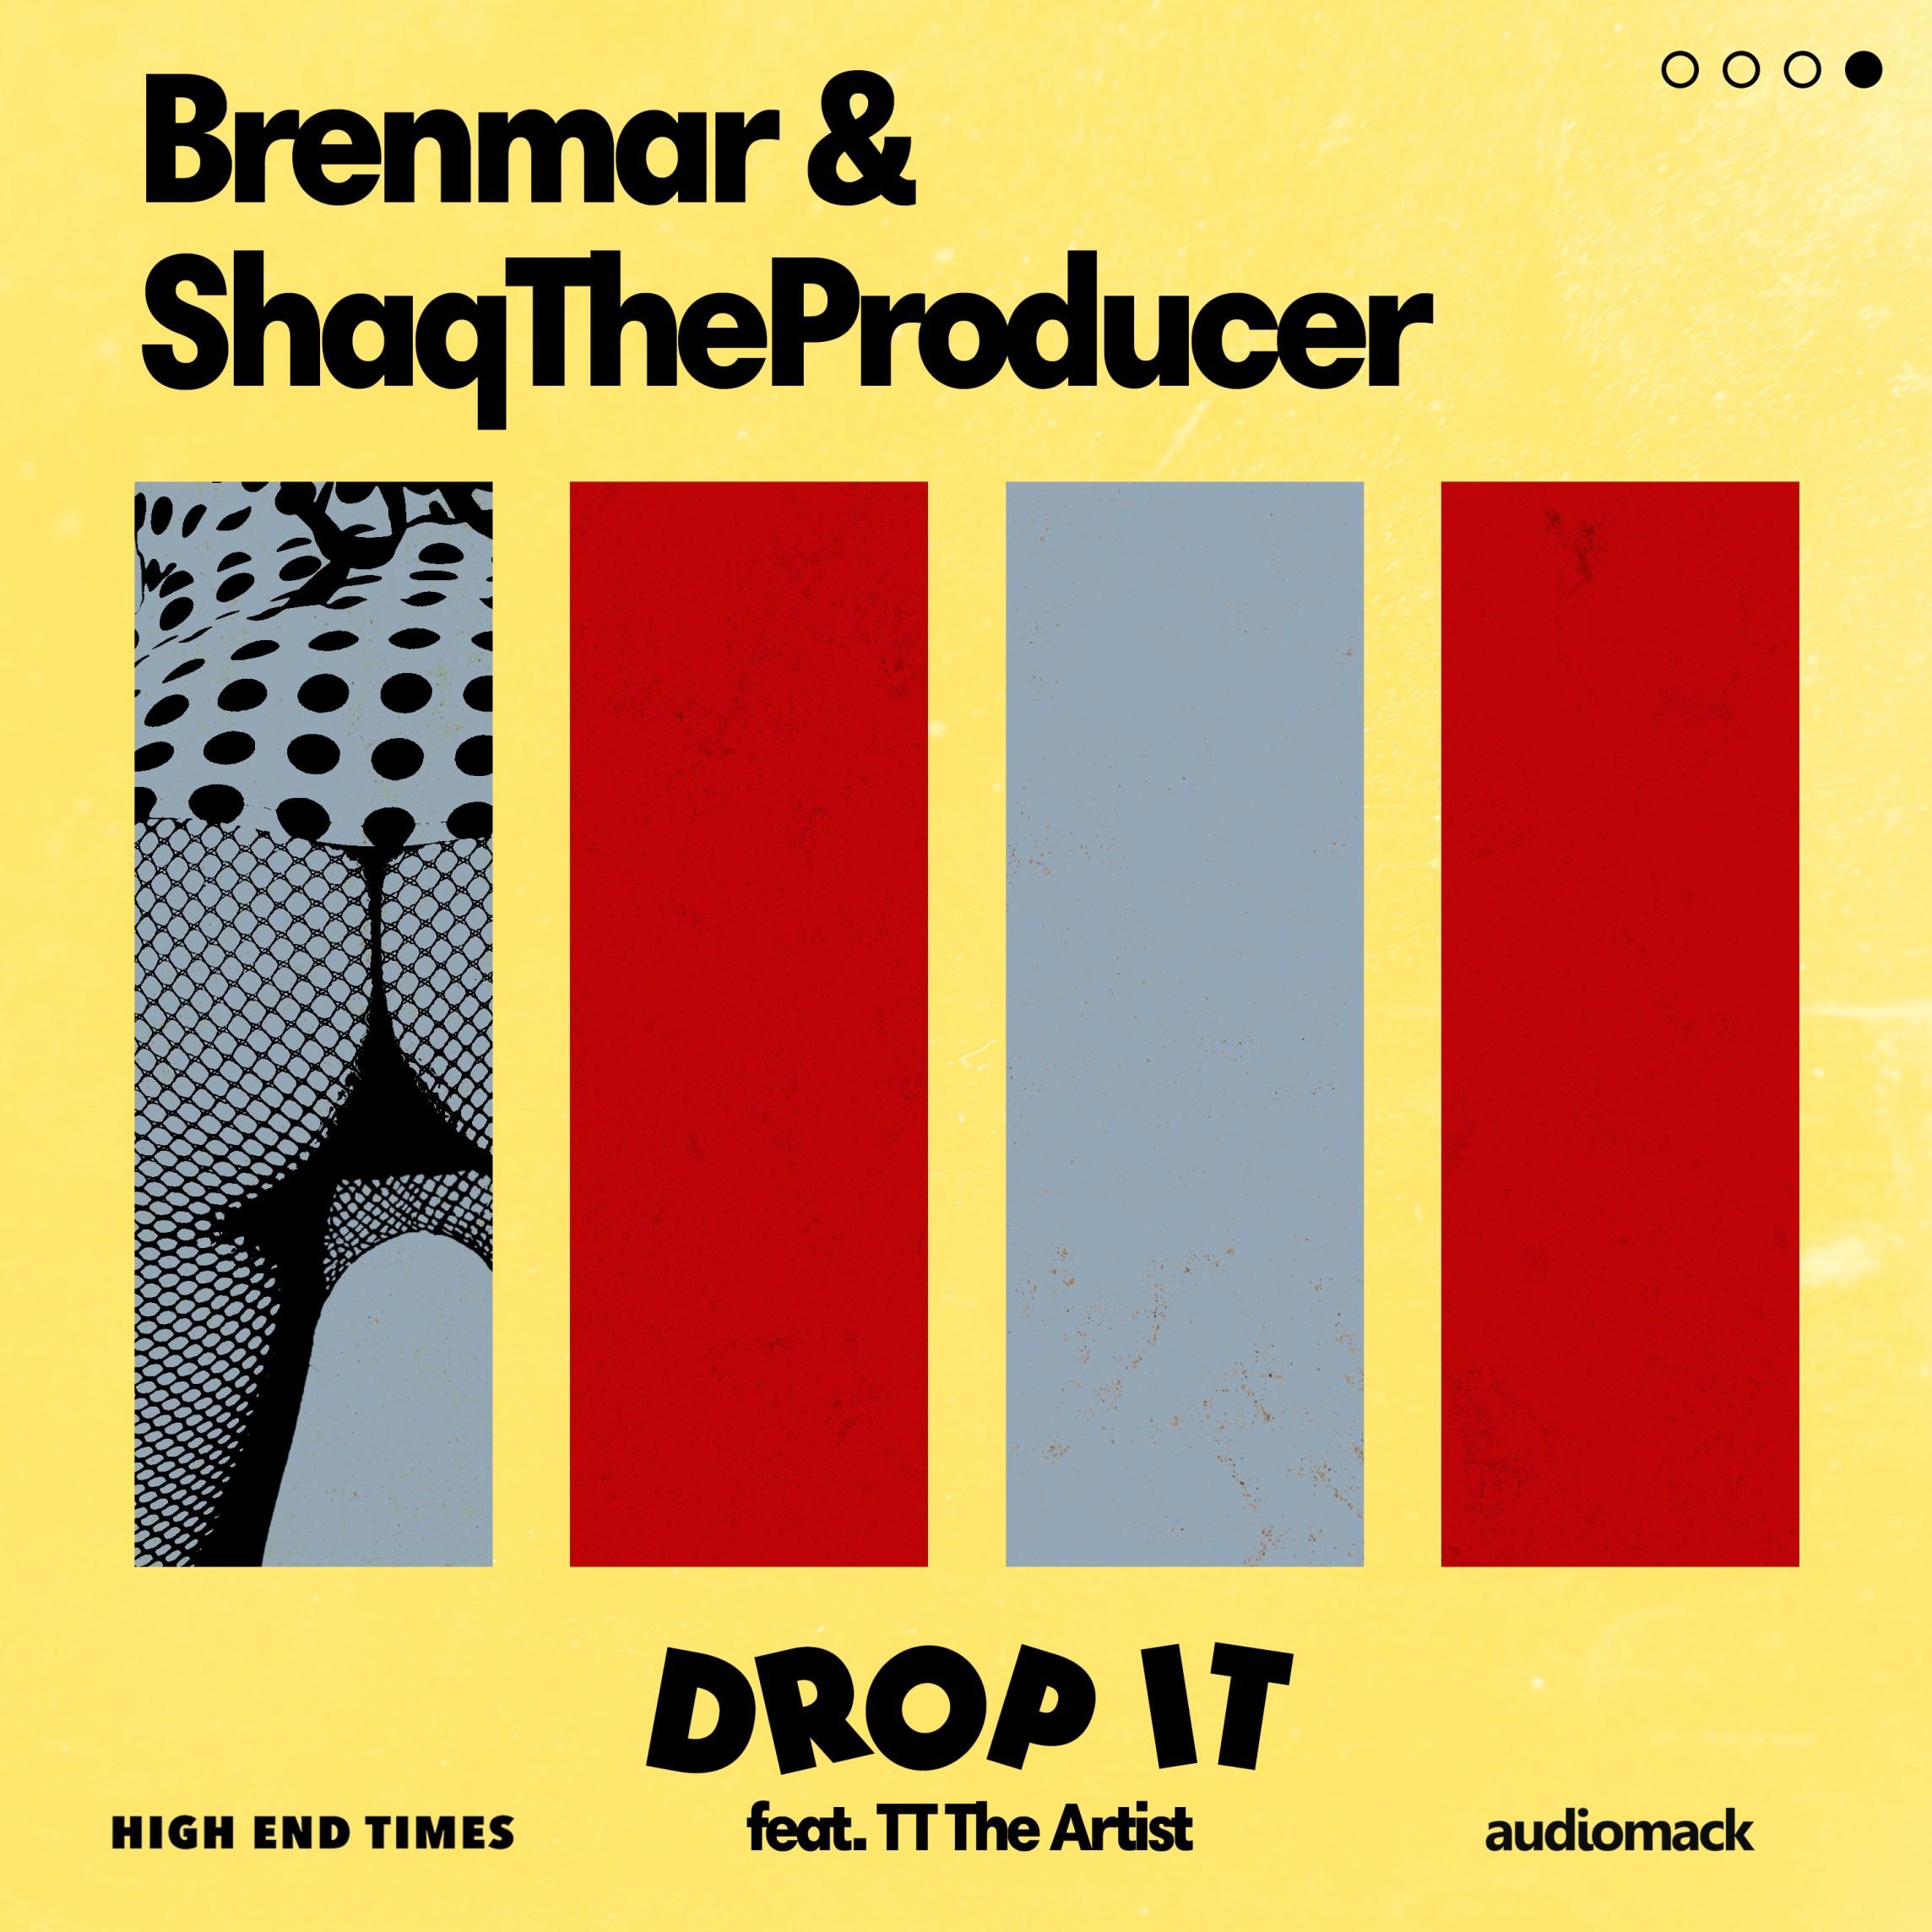 Drop-It-ft-TT-The-Artist-mp3-image.jpg